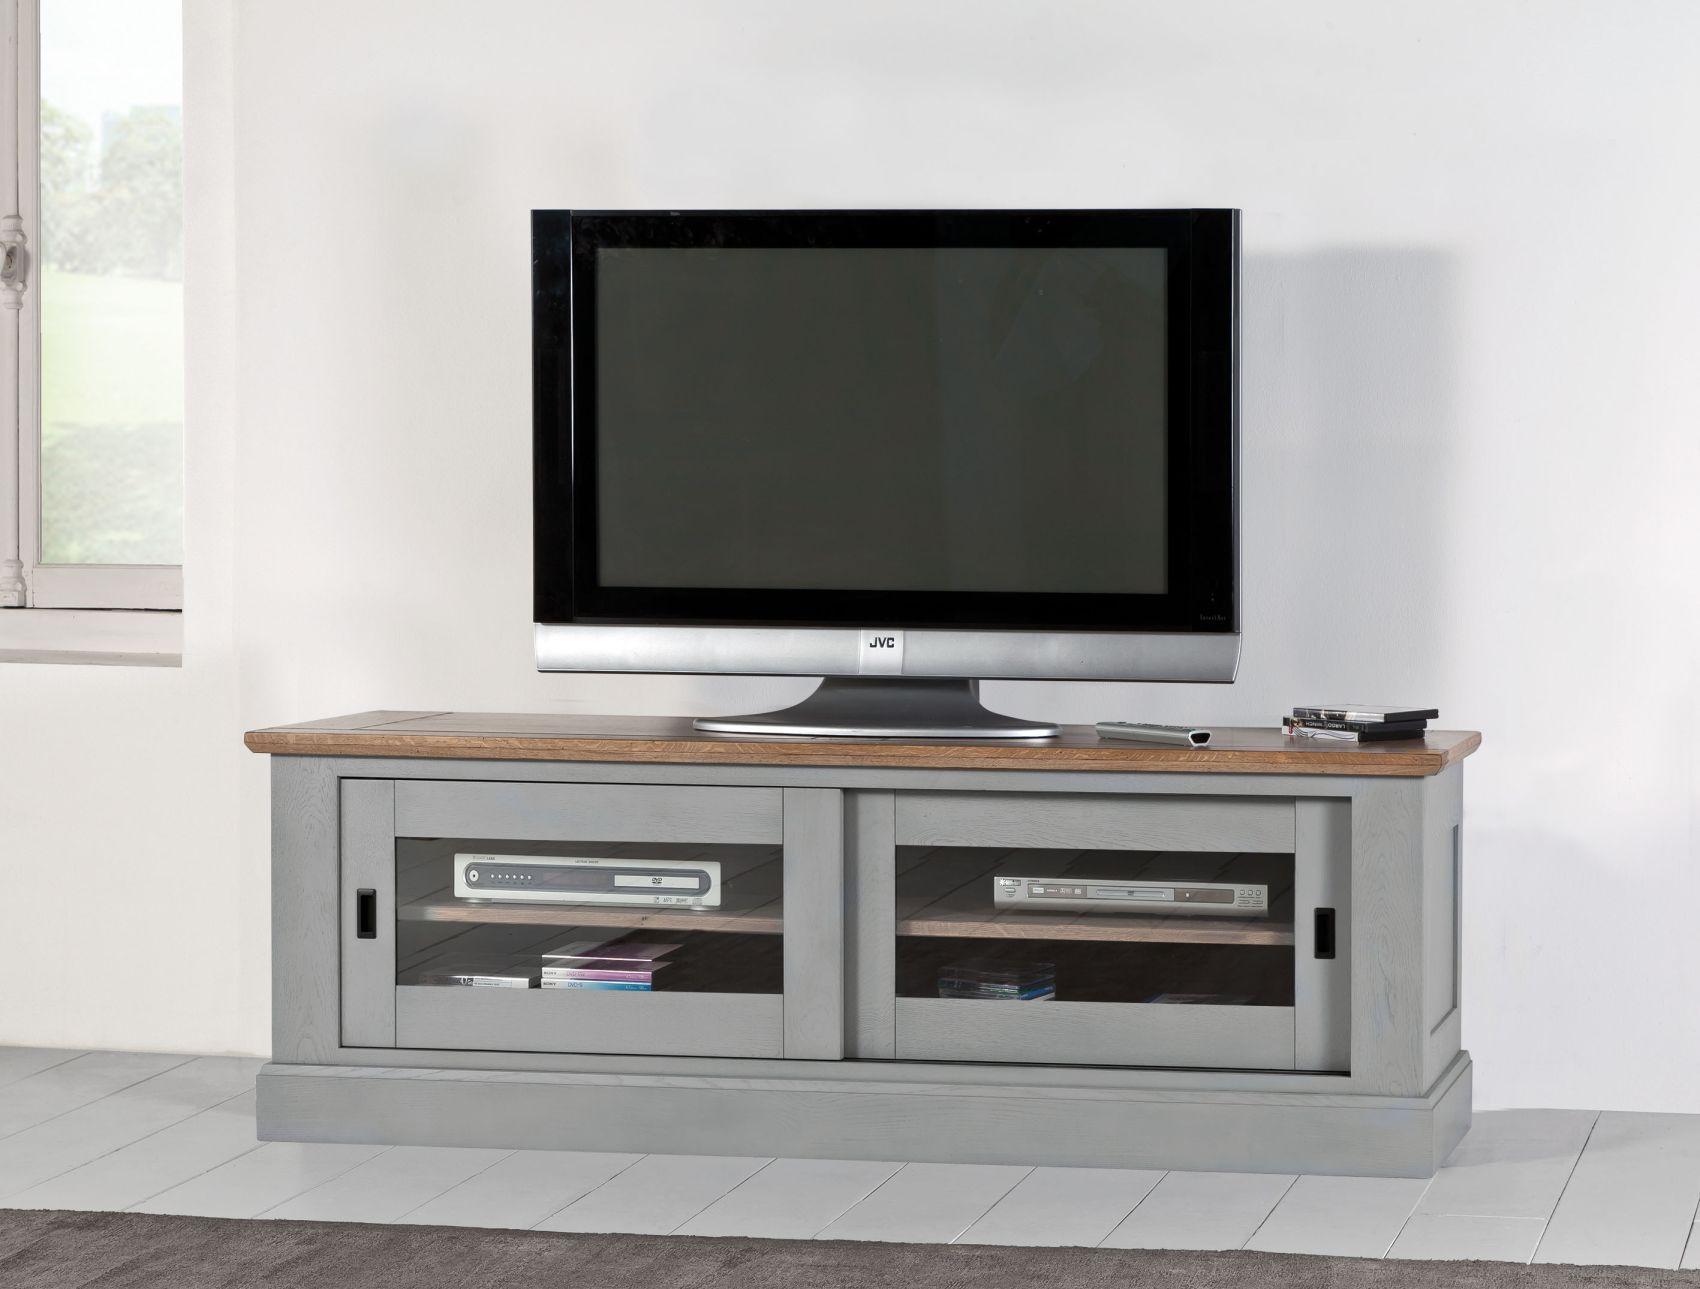 Meuble tv romance meubles fouillard - Meuble tv miroir ...